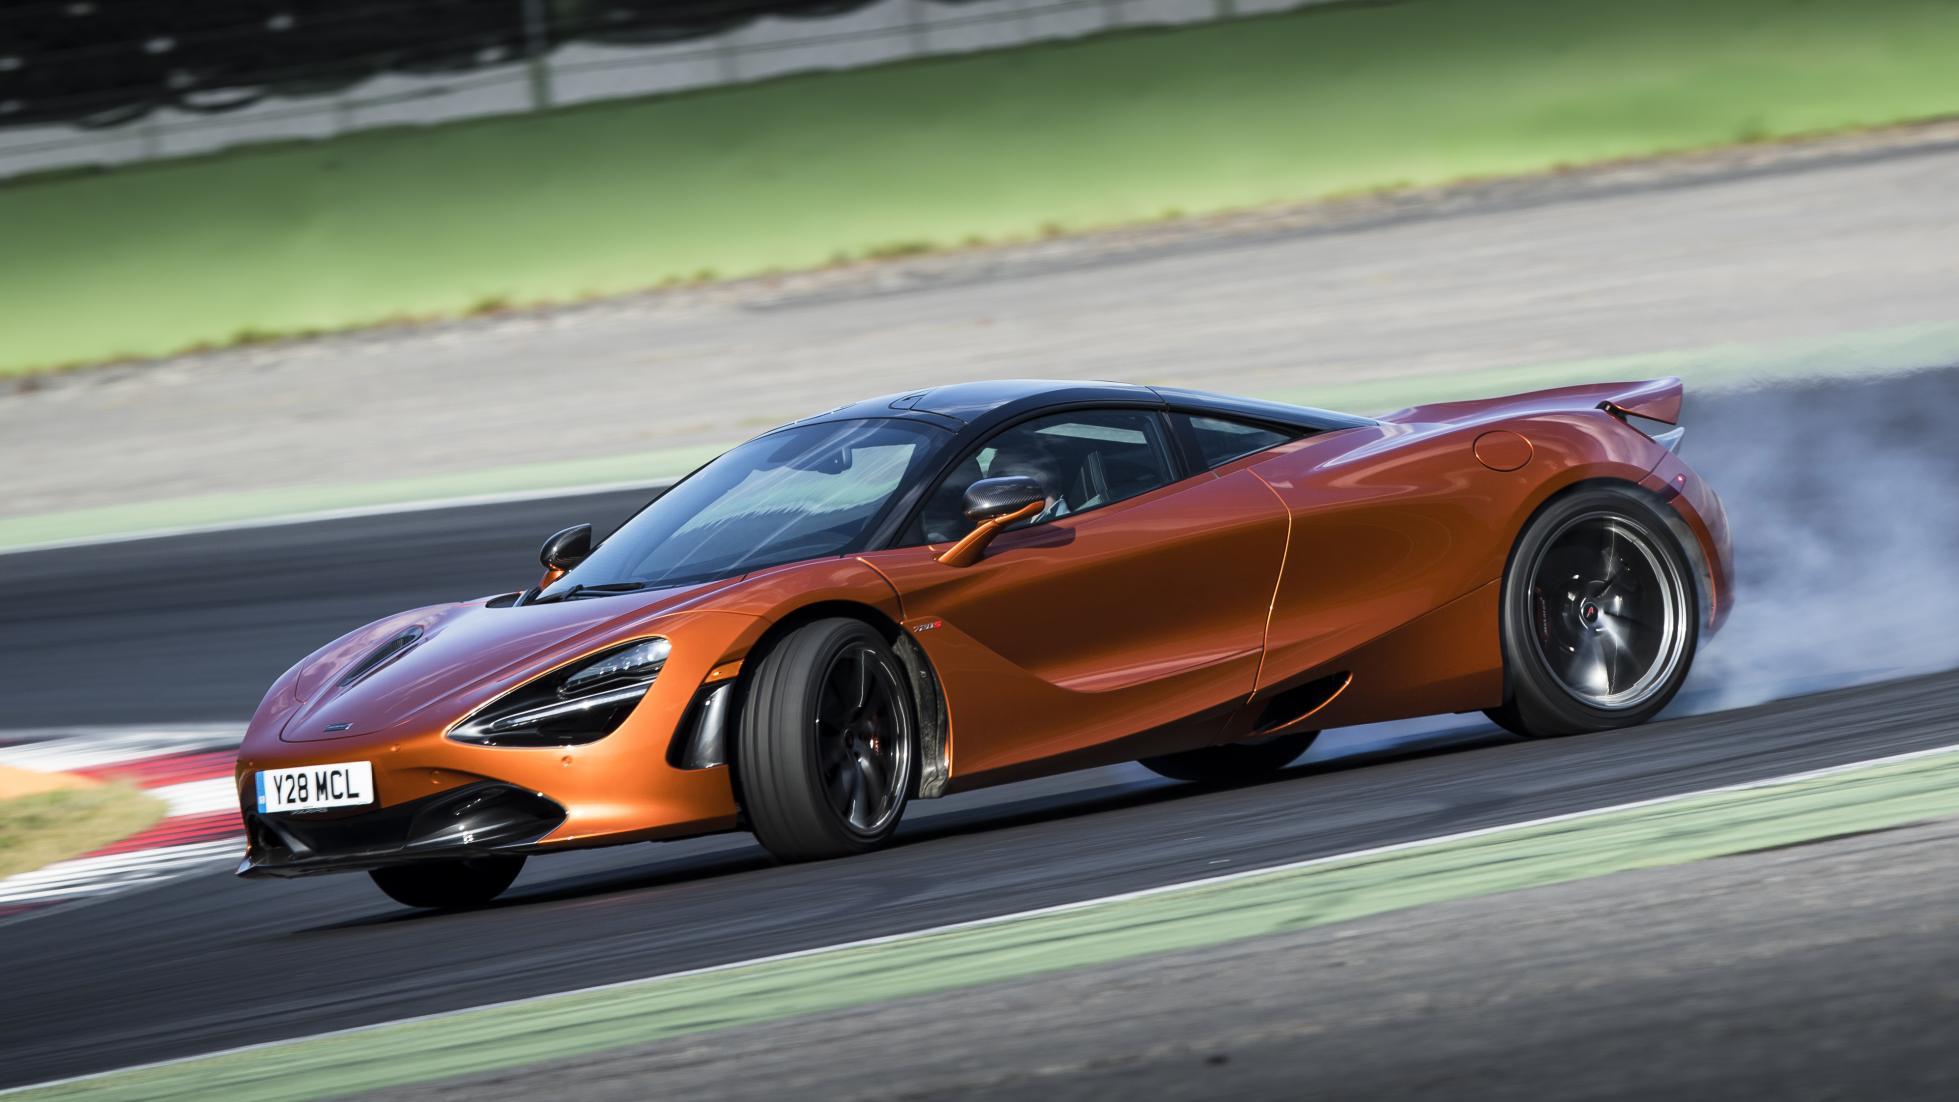 McLaren 720s orange side